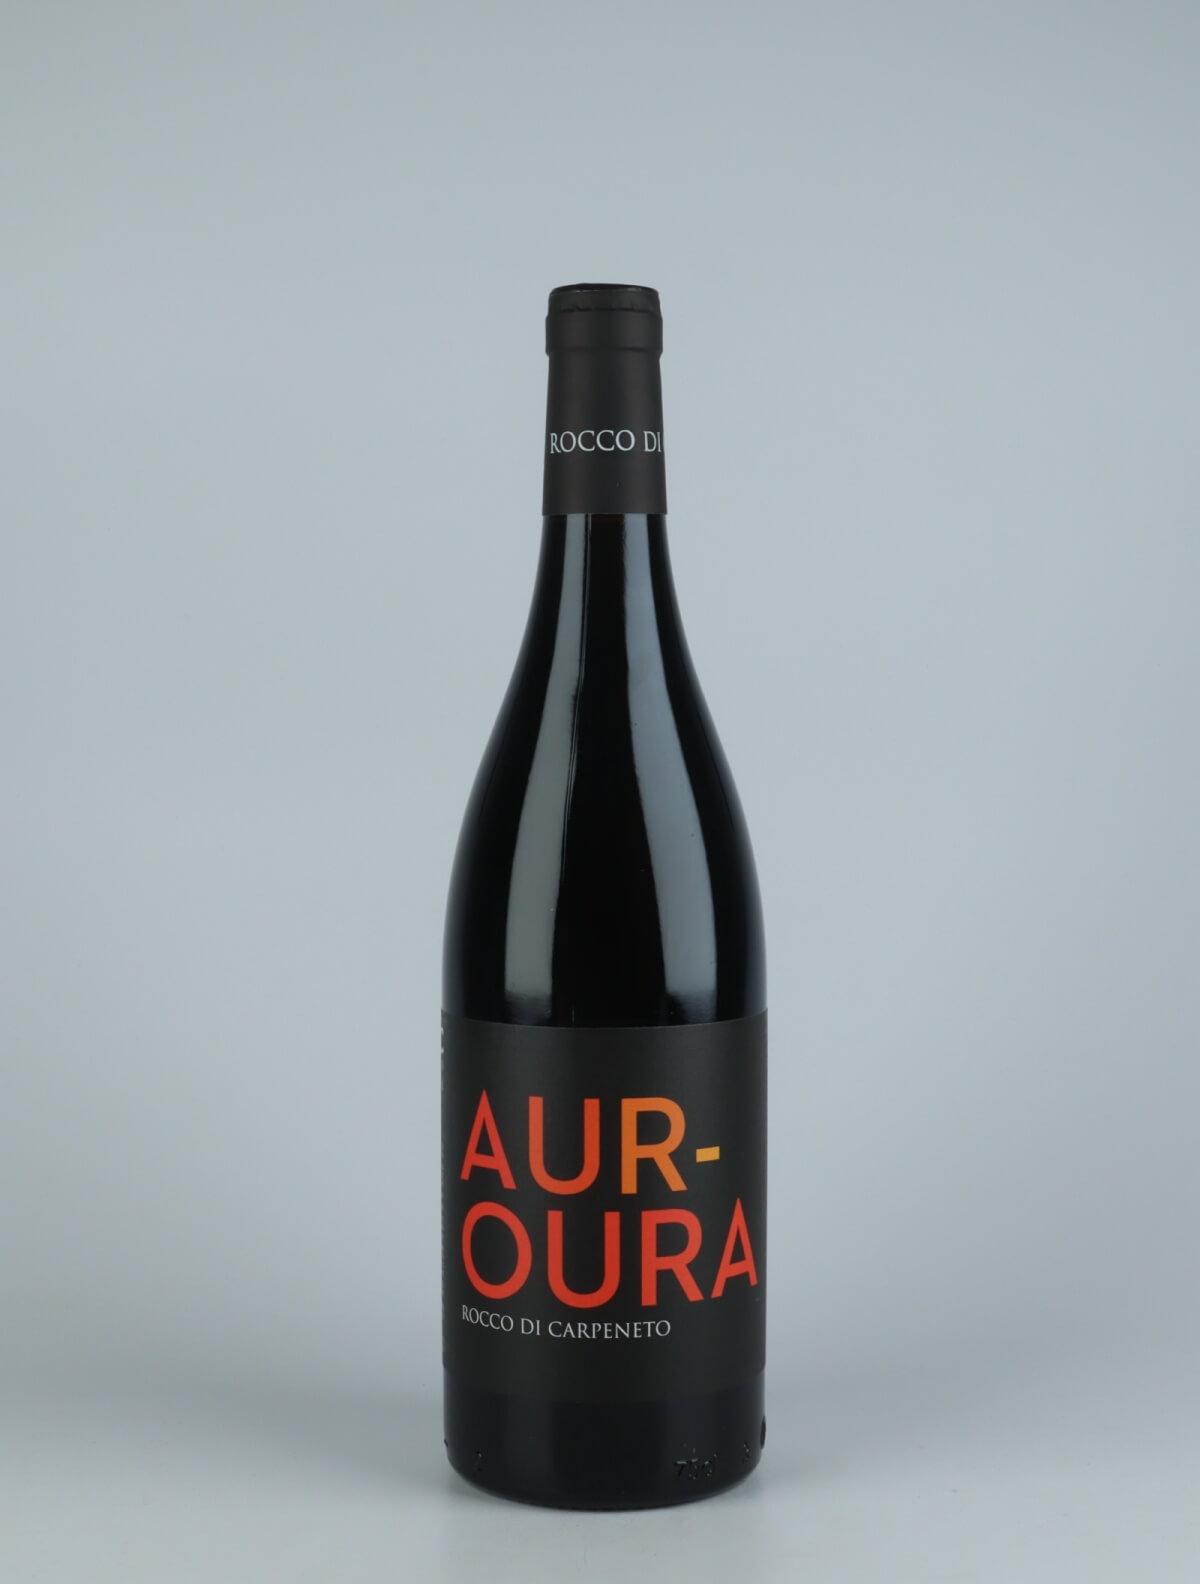 Aur-Oura